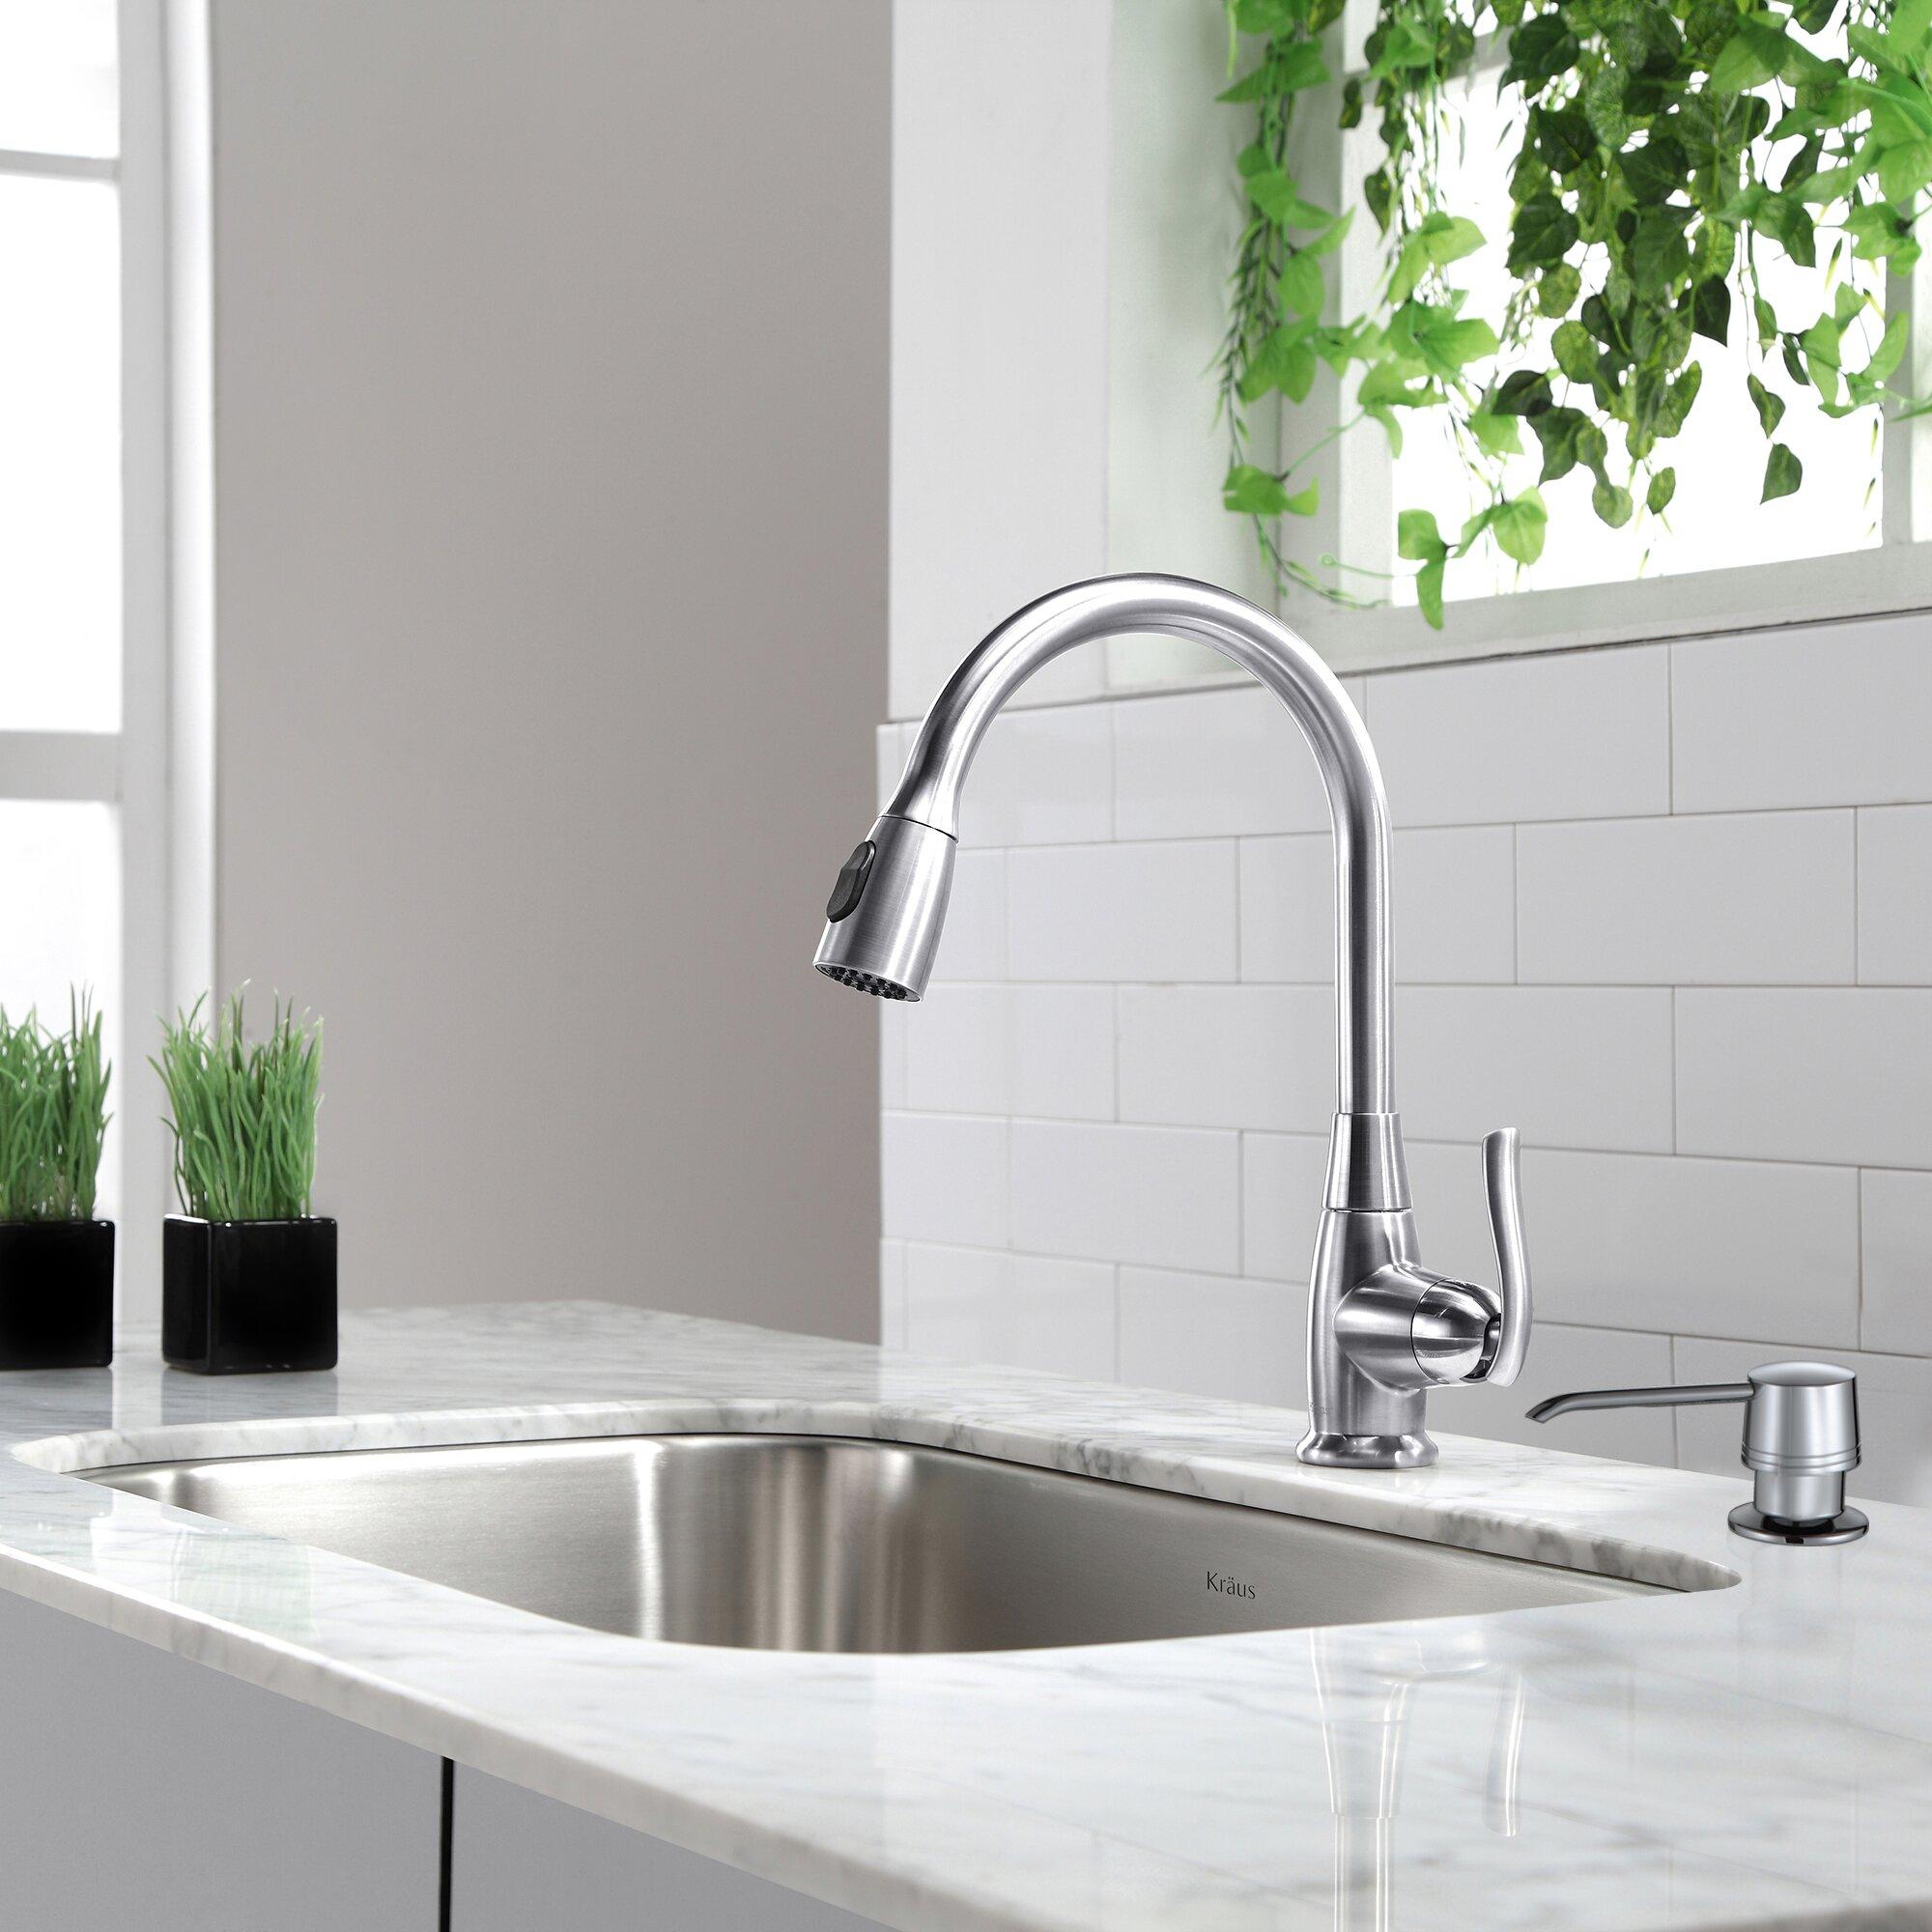 kraus one handle single hole kitchen faucet amp reviews kraus kpf 2130 review kitchen faucet reviews